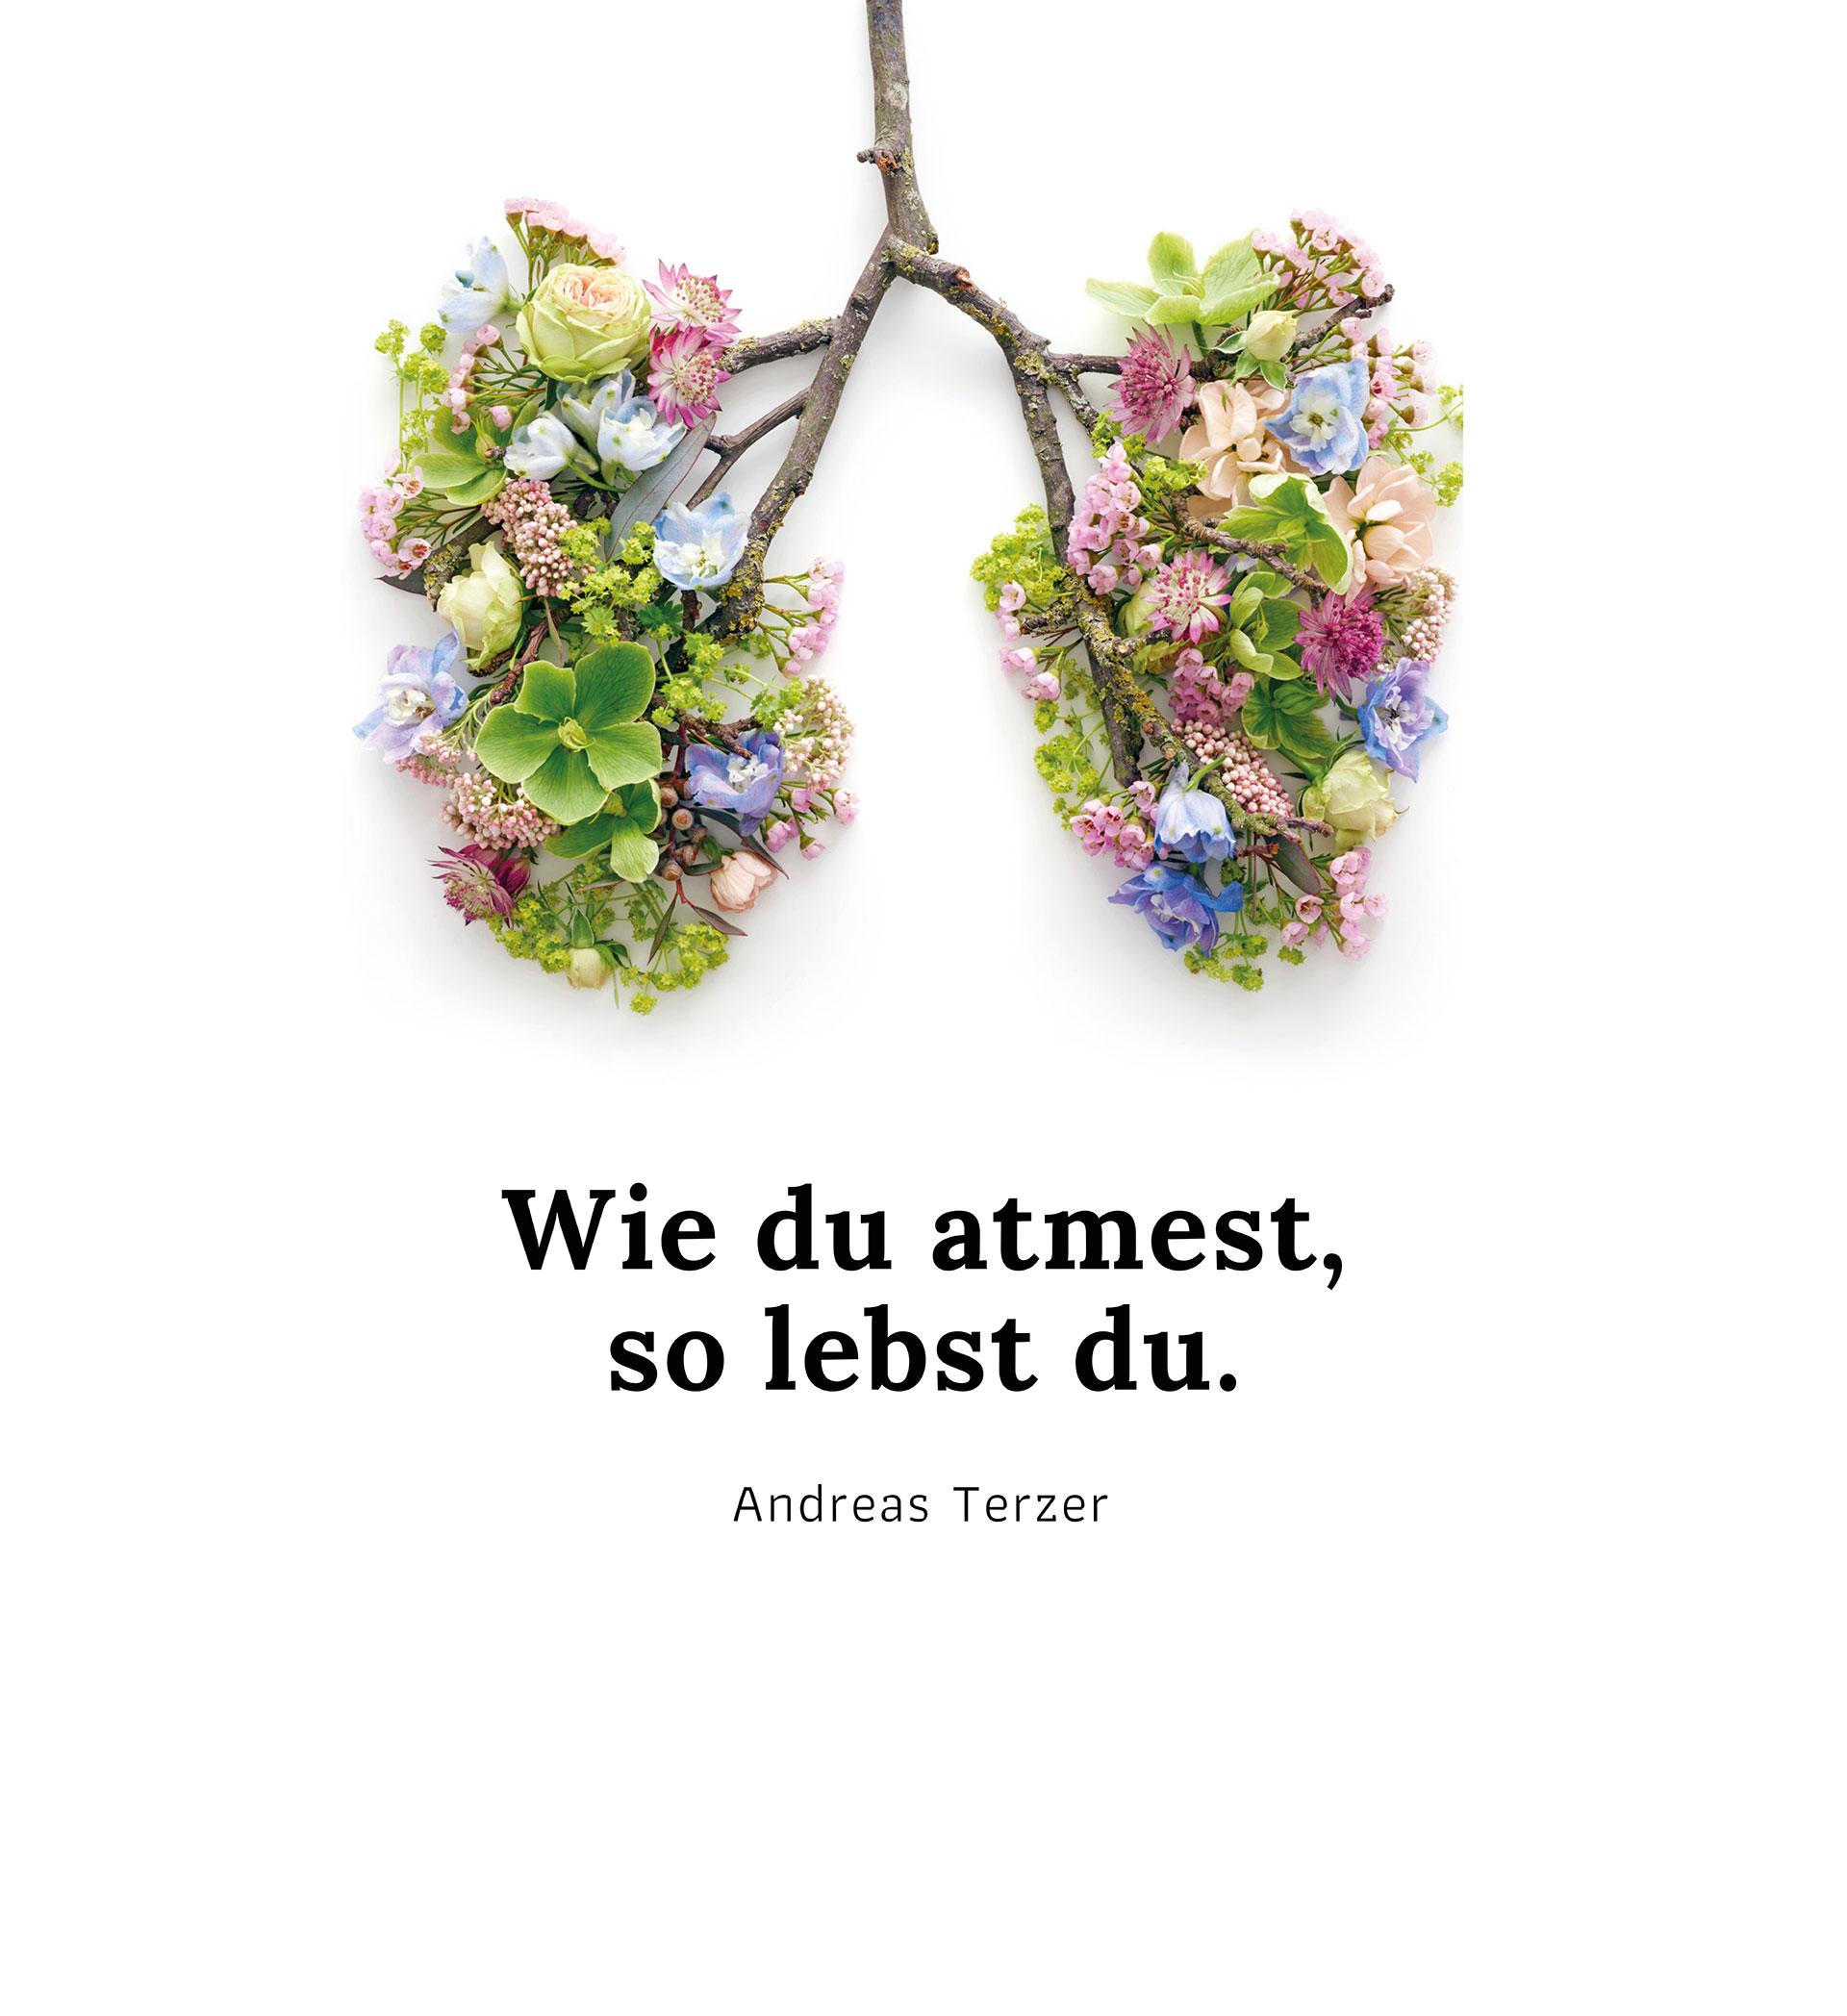 Fritz-Idiag_Atemlounge2.jpg